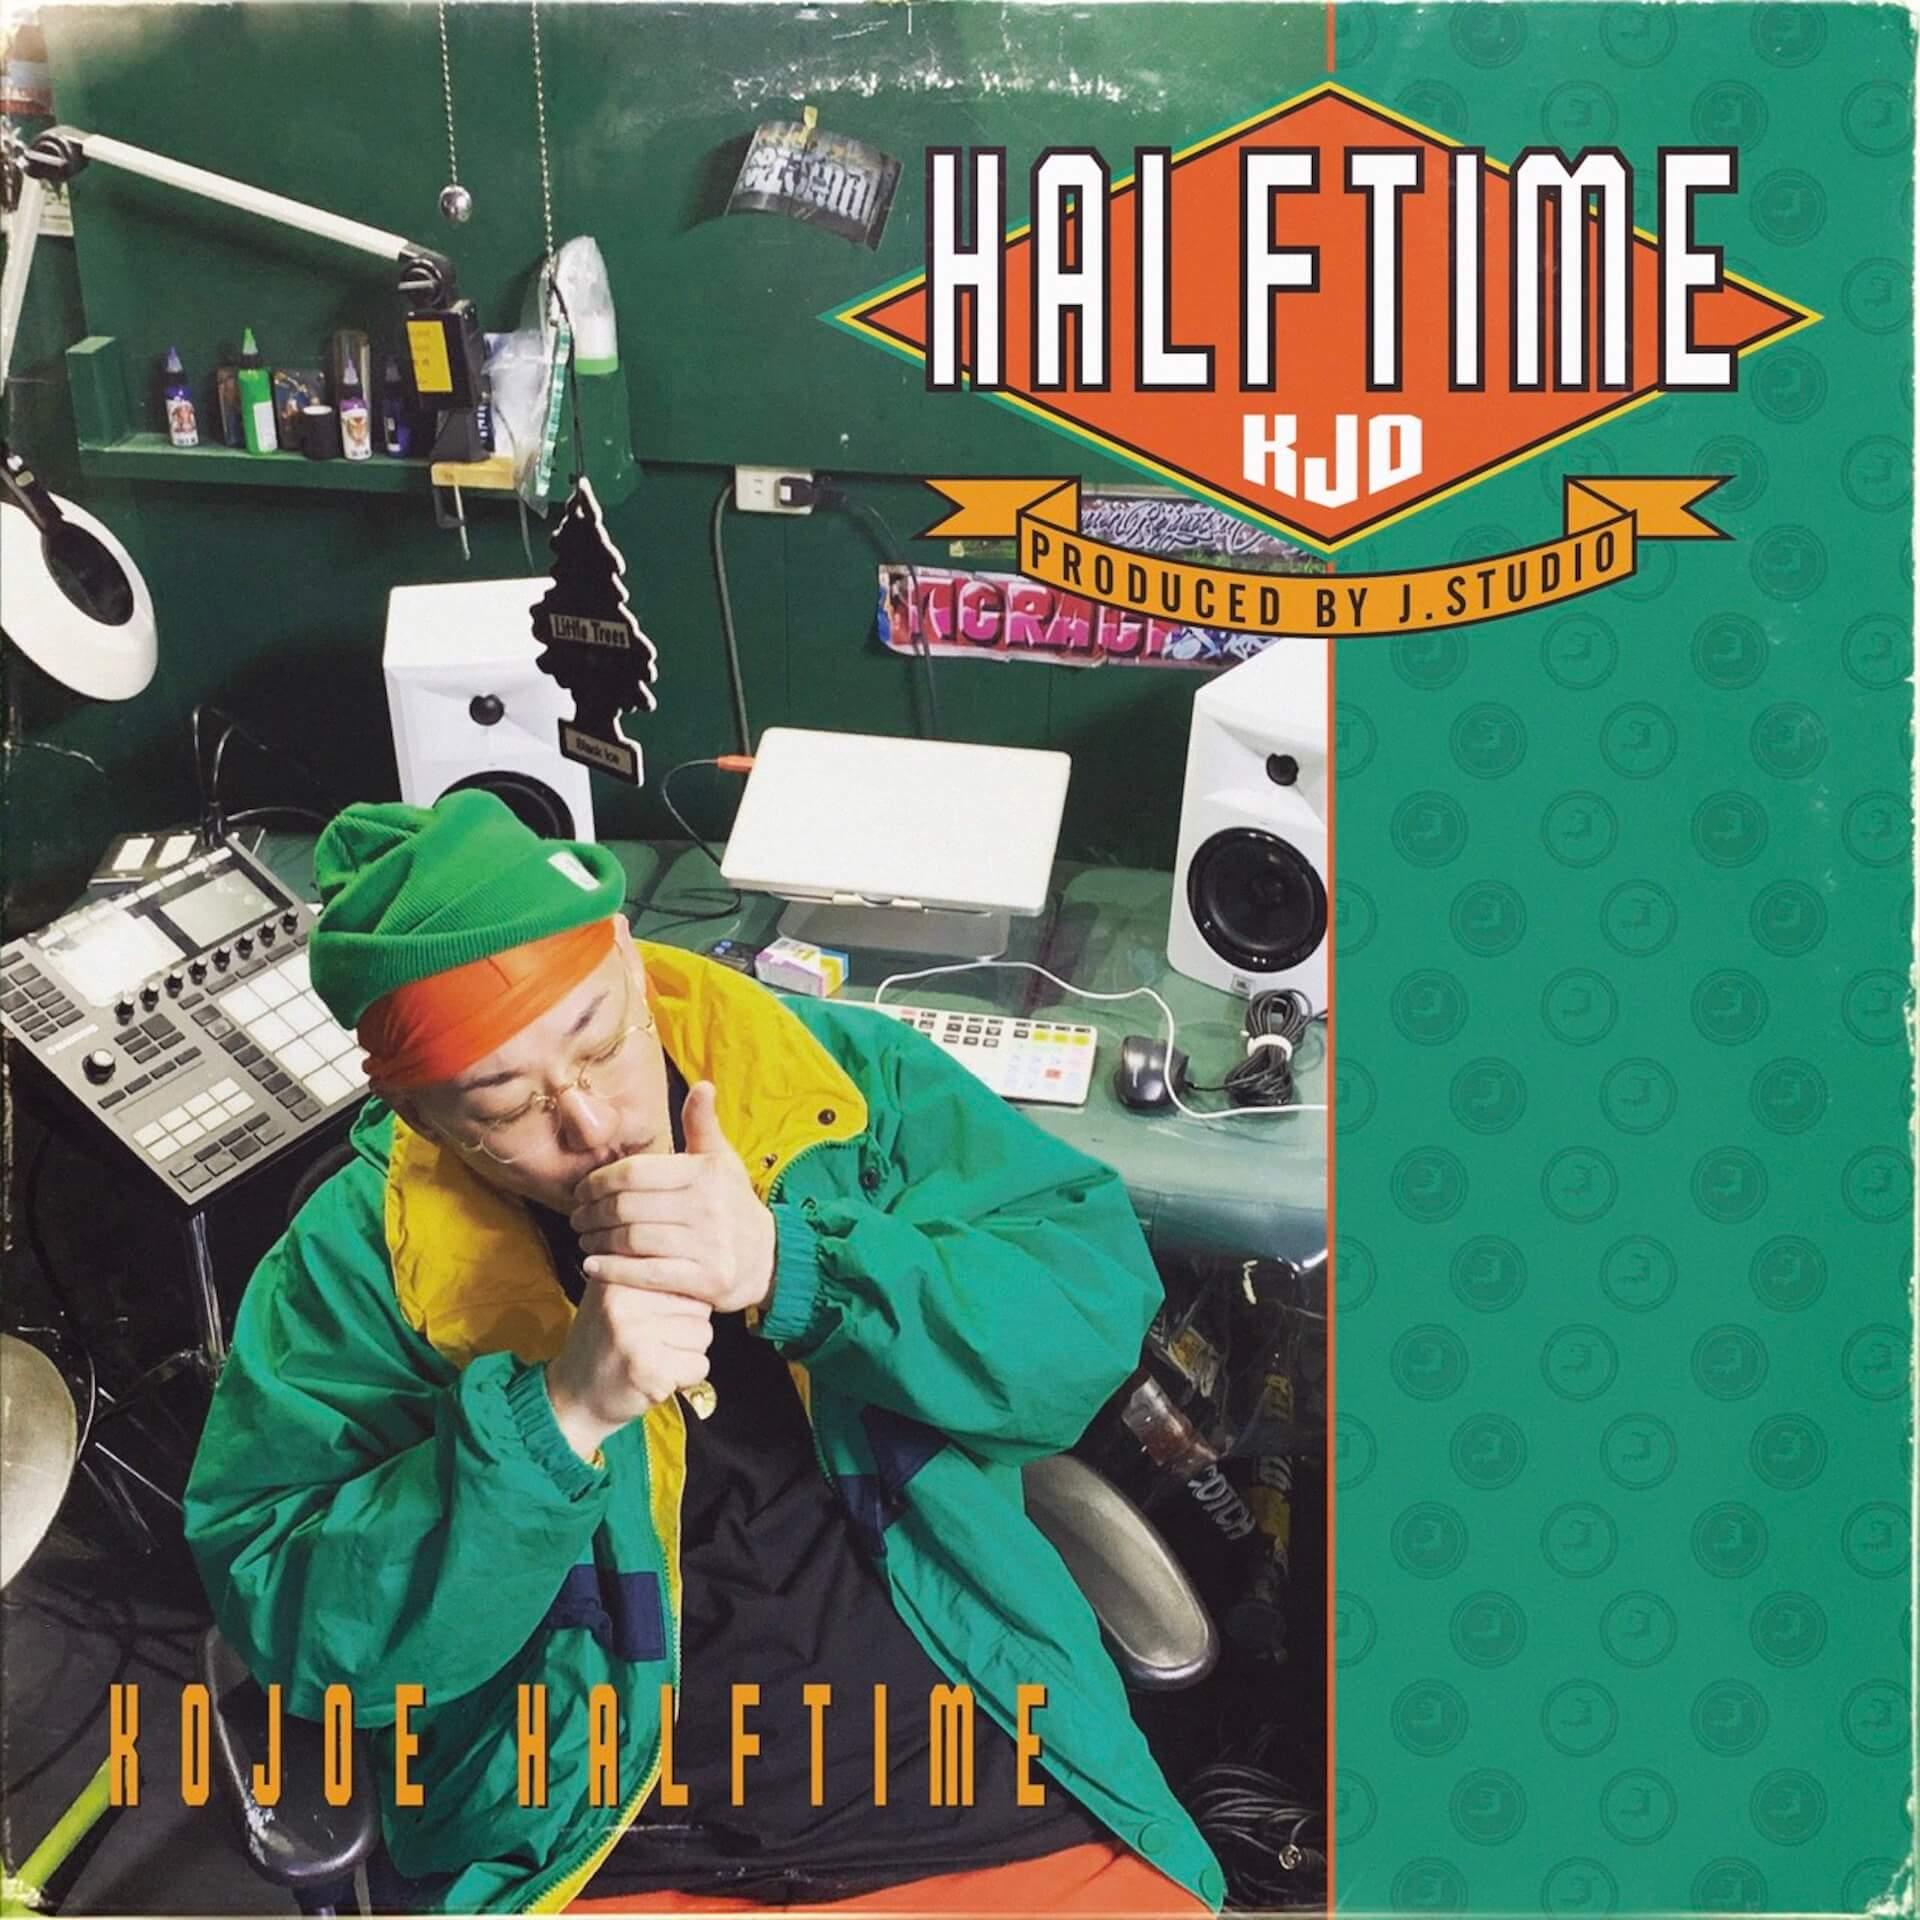 Kojoeのニューアルバム『HALFTIME』が本日リリース!BUPPON、ISSUGI、JASS、MFSなど豪華客演も music210519_kojoe_halftime_2